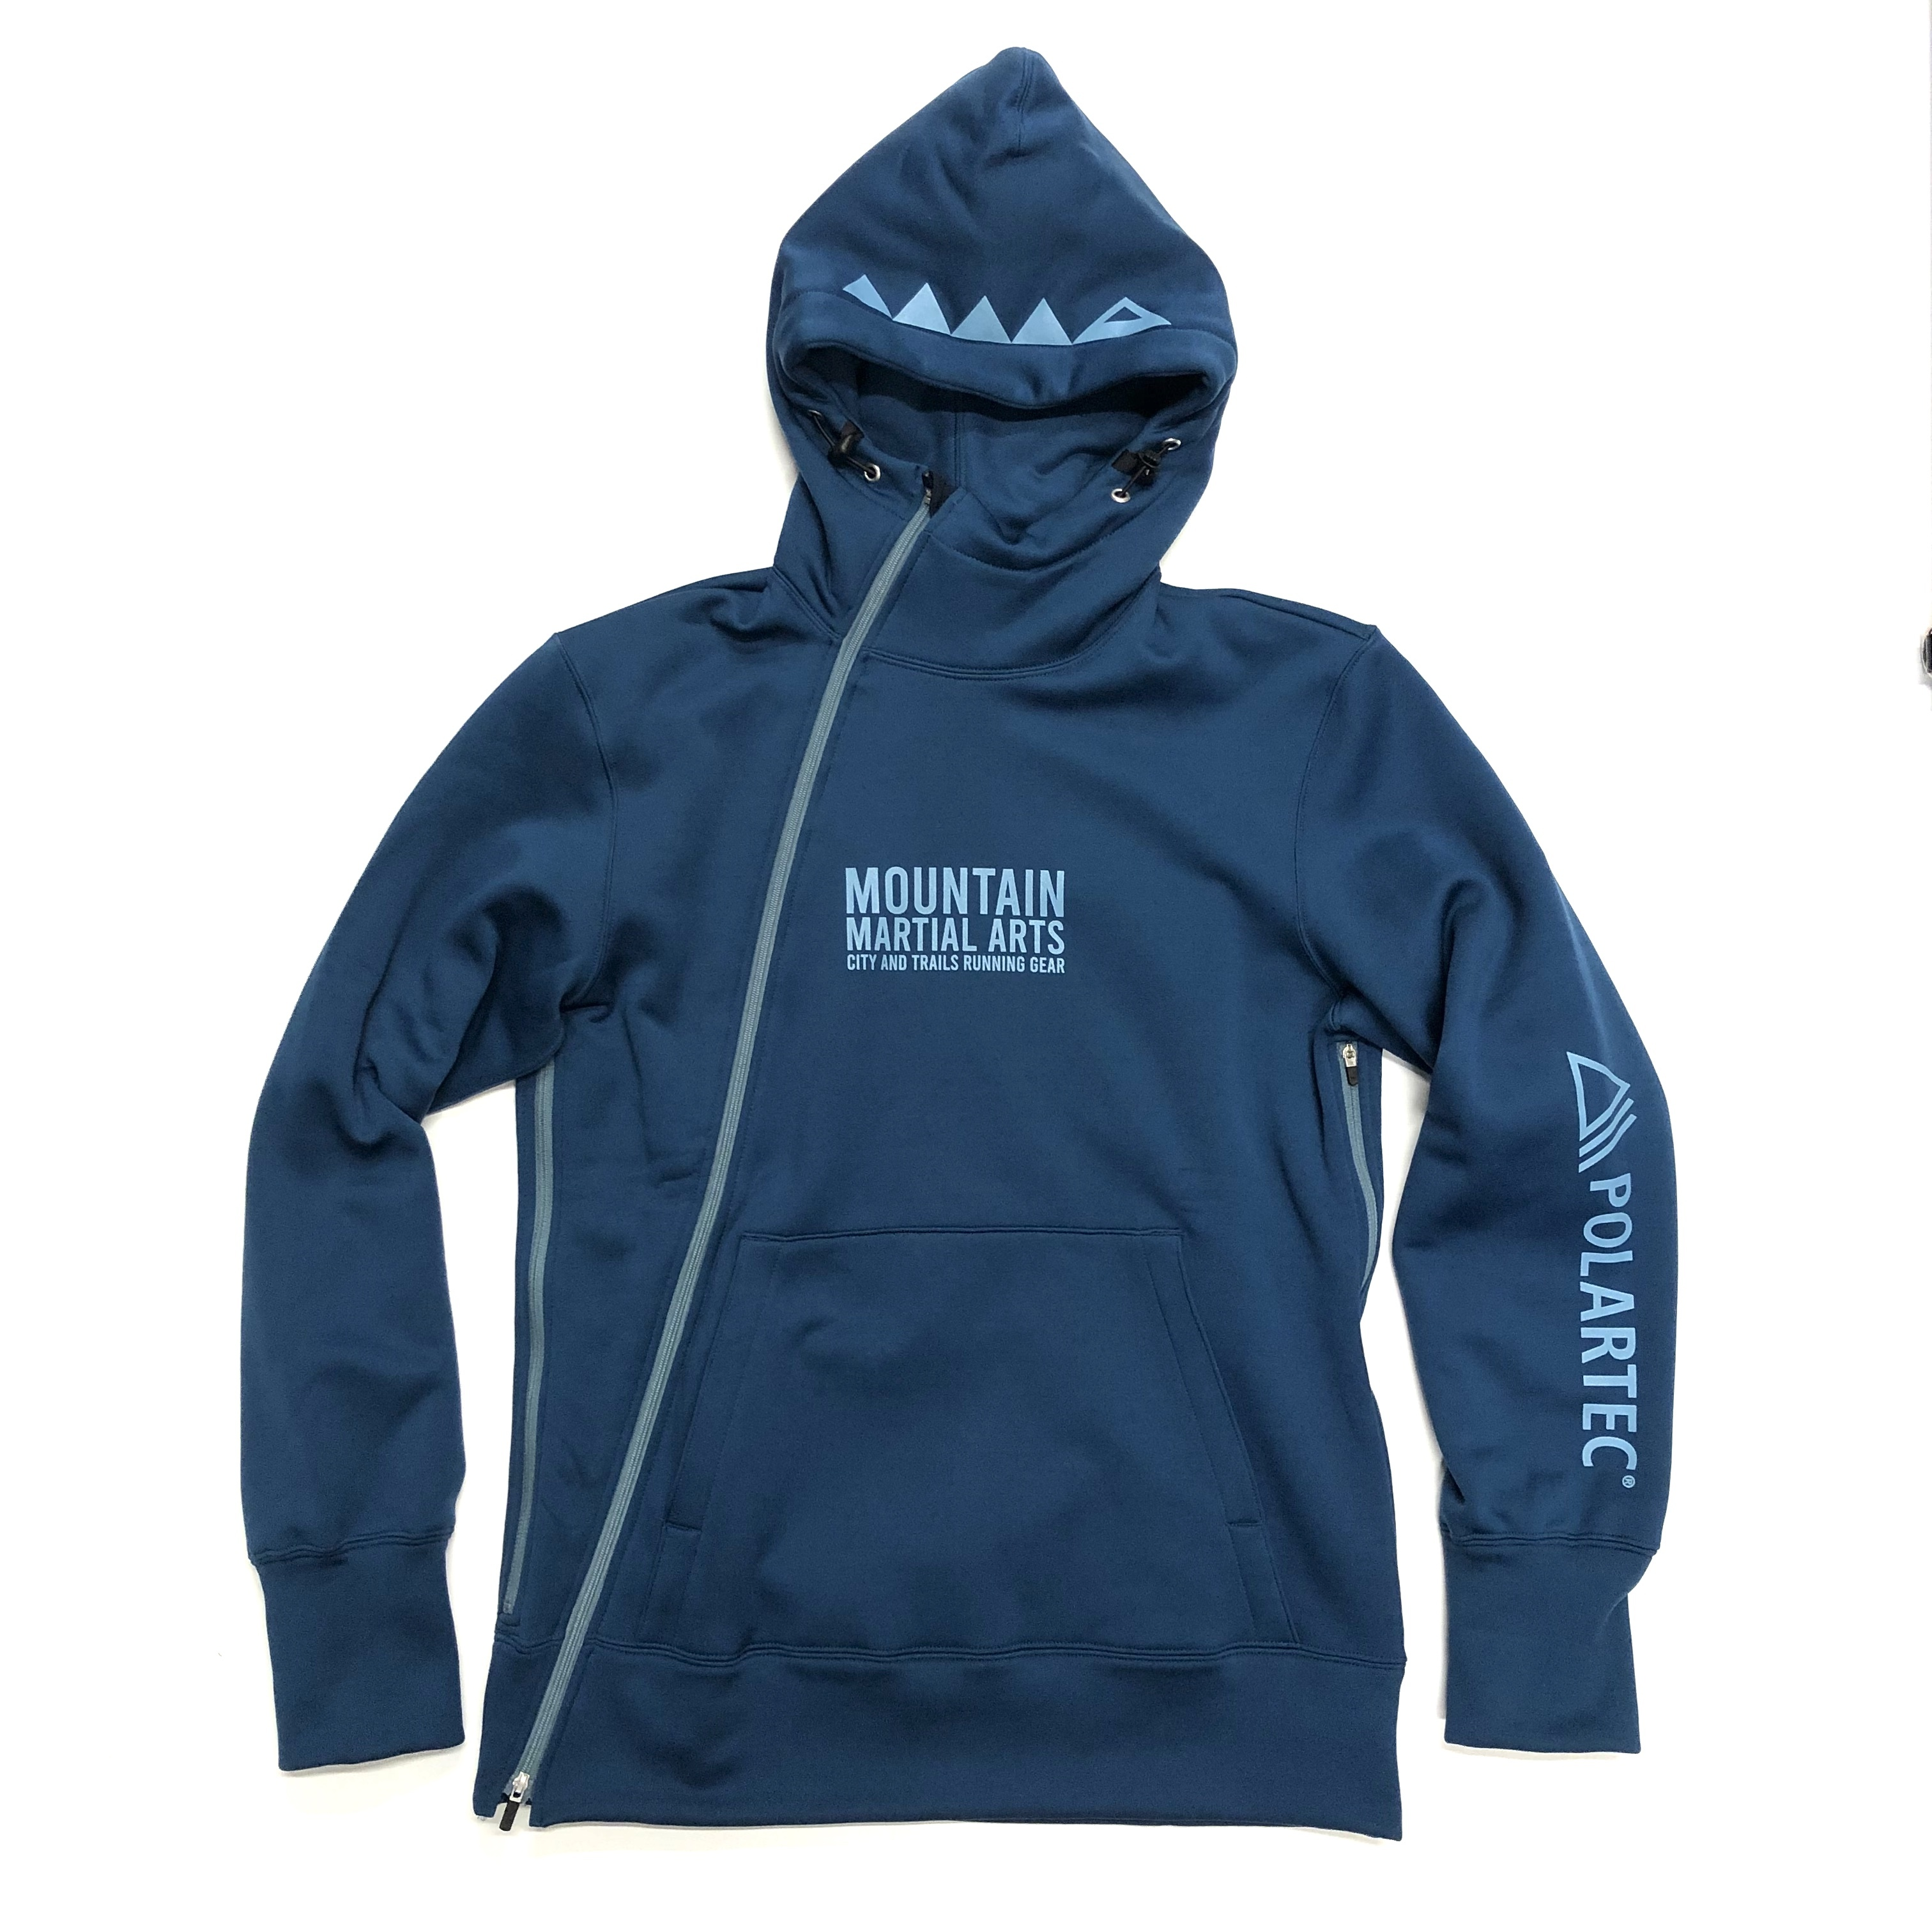 Mountain Martial Arts / MMA POLARTEC®︎ PSP Slant Zip Hoodie 《Sea Navy》